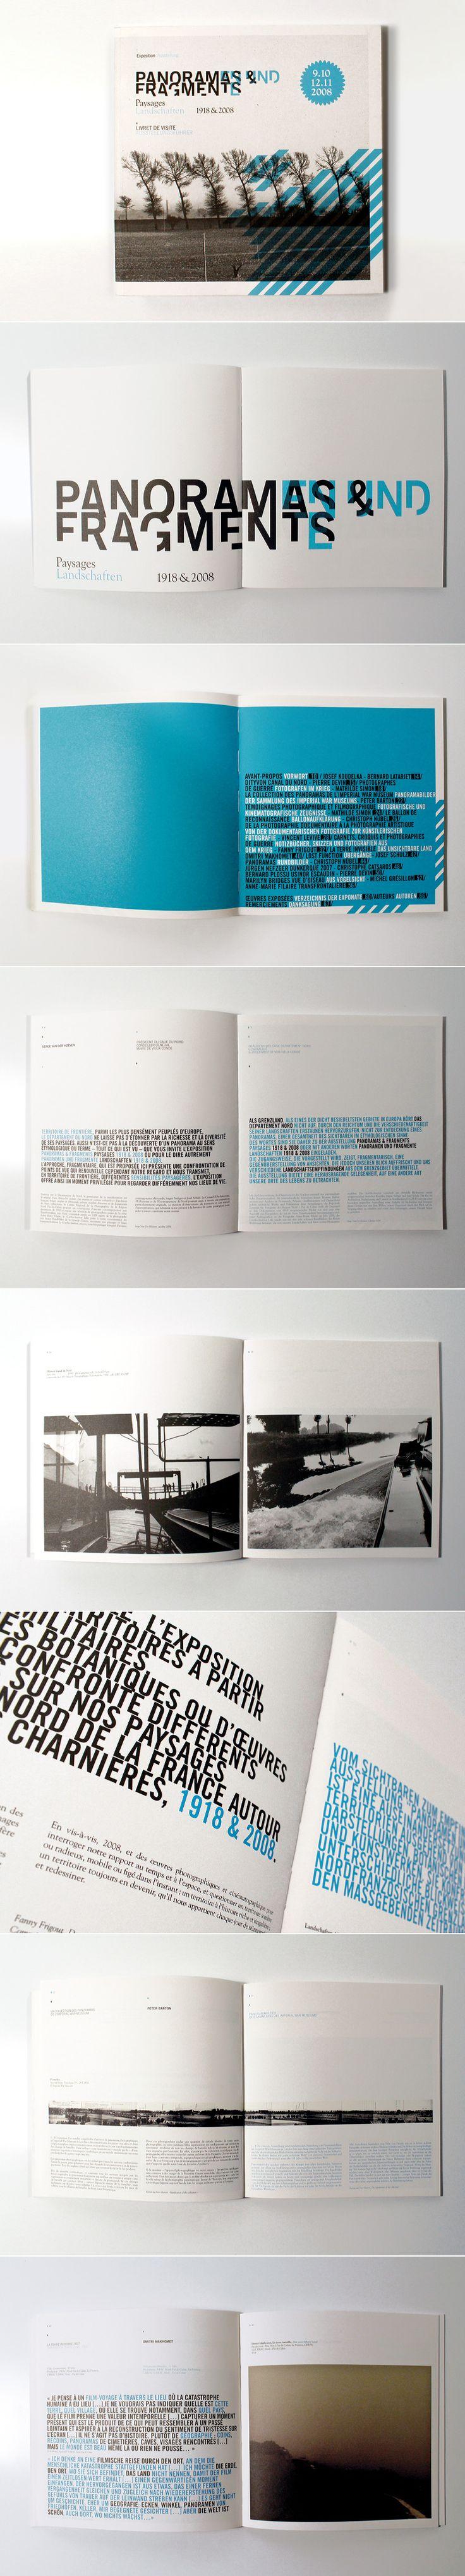 Panoramas & Fragments  Paysages 1918-2008